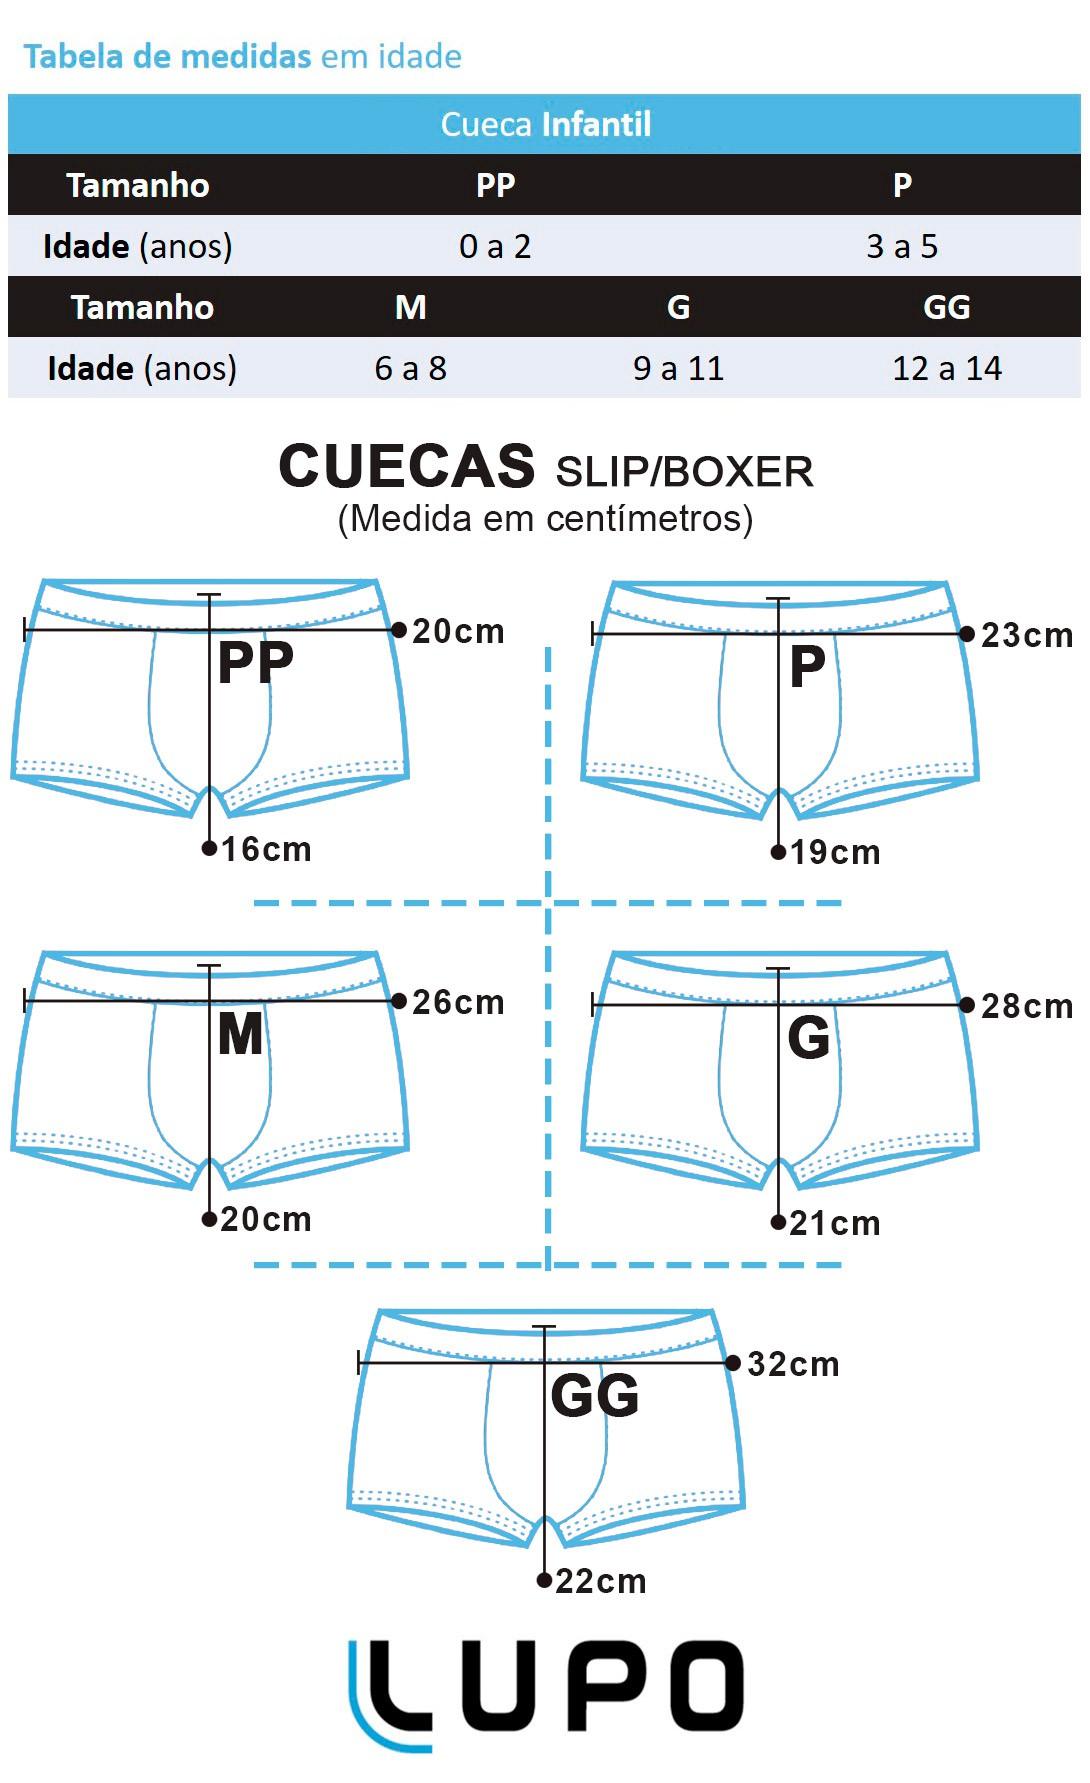 Cueca Infantil Boxer Microfibra Azul Lupo: Tabela de medidas